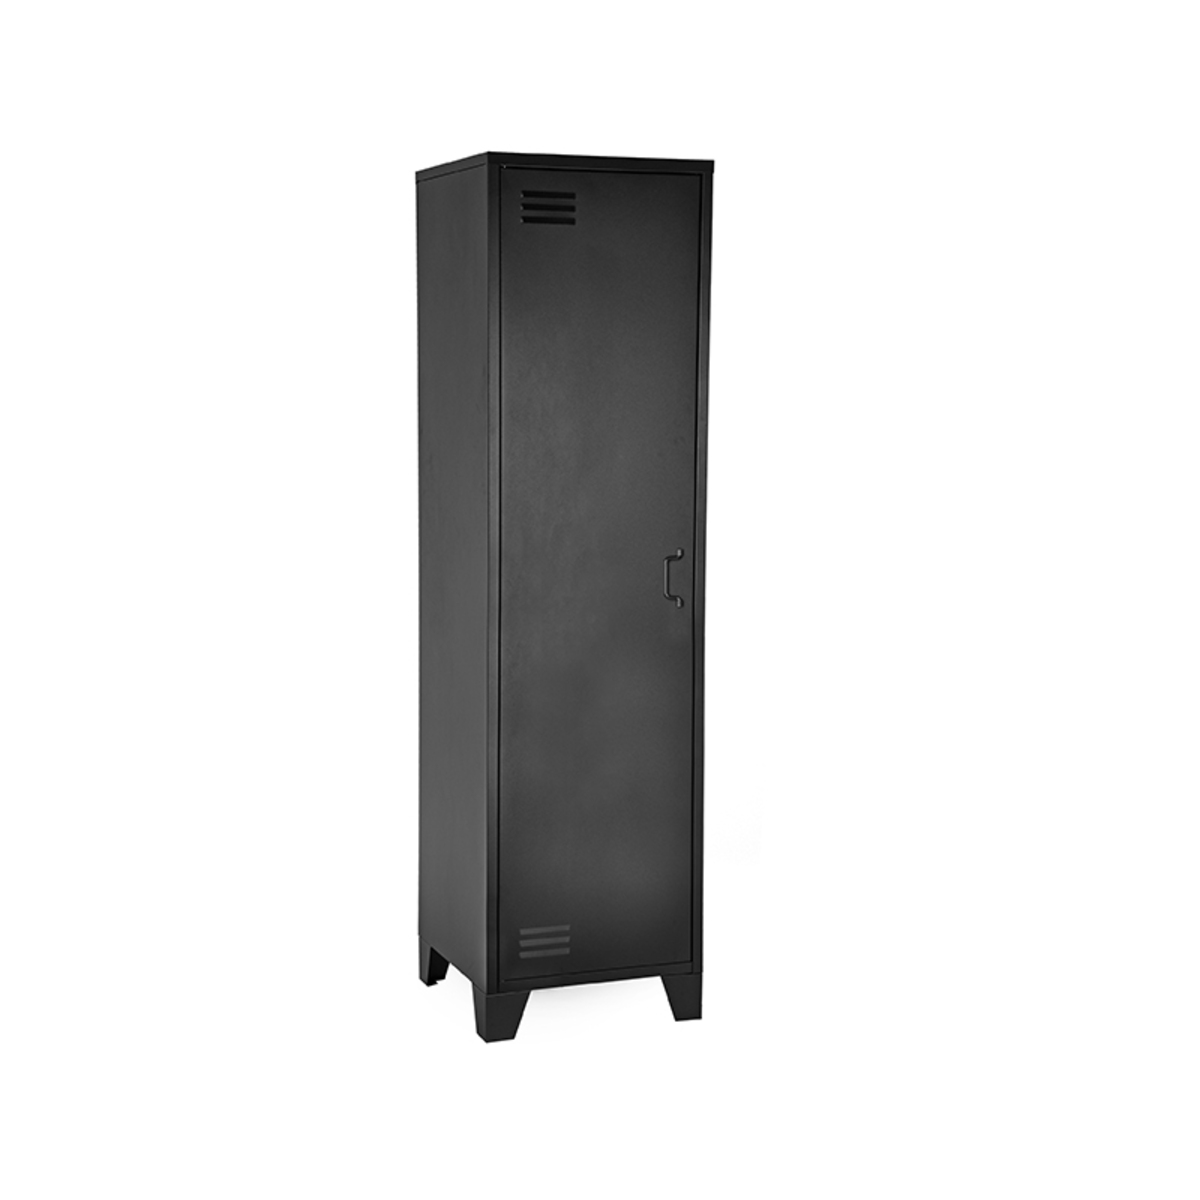 LABEL51 Bergkast Fence - Zwart - Metaal - 1 Deurs